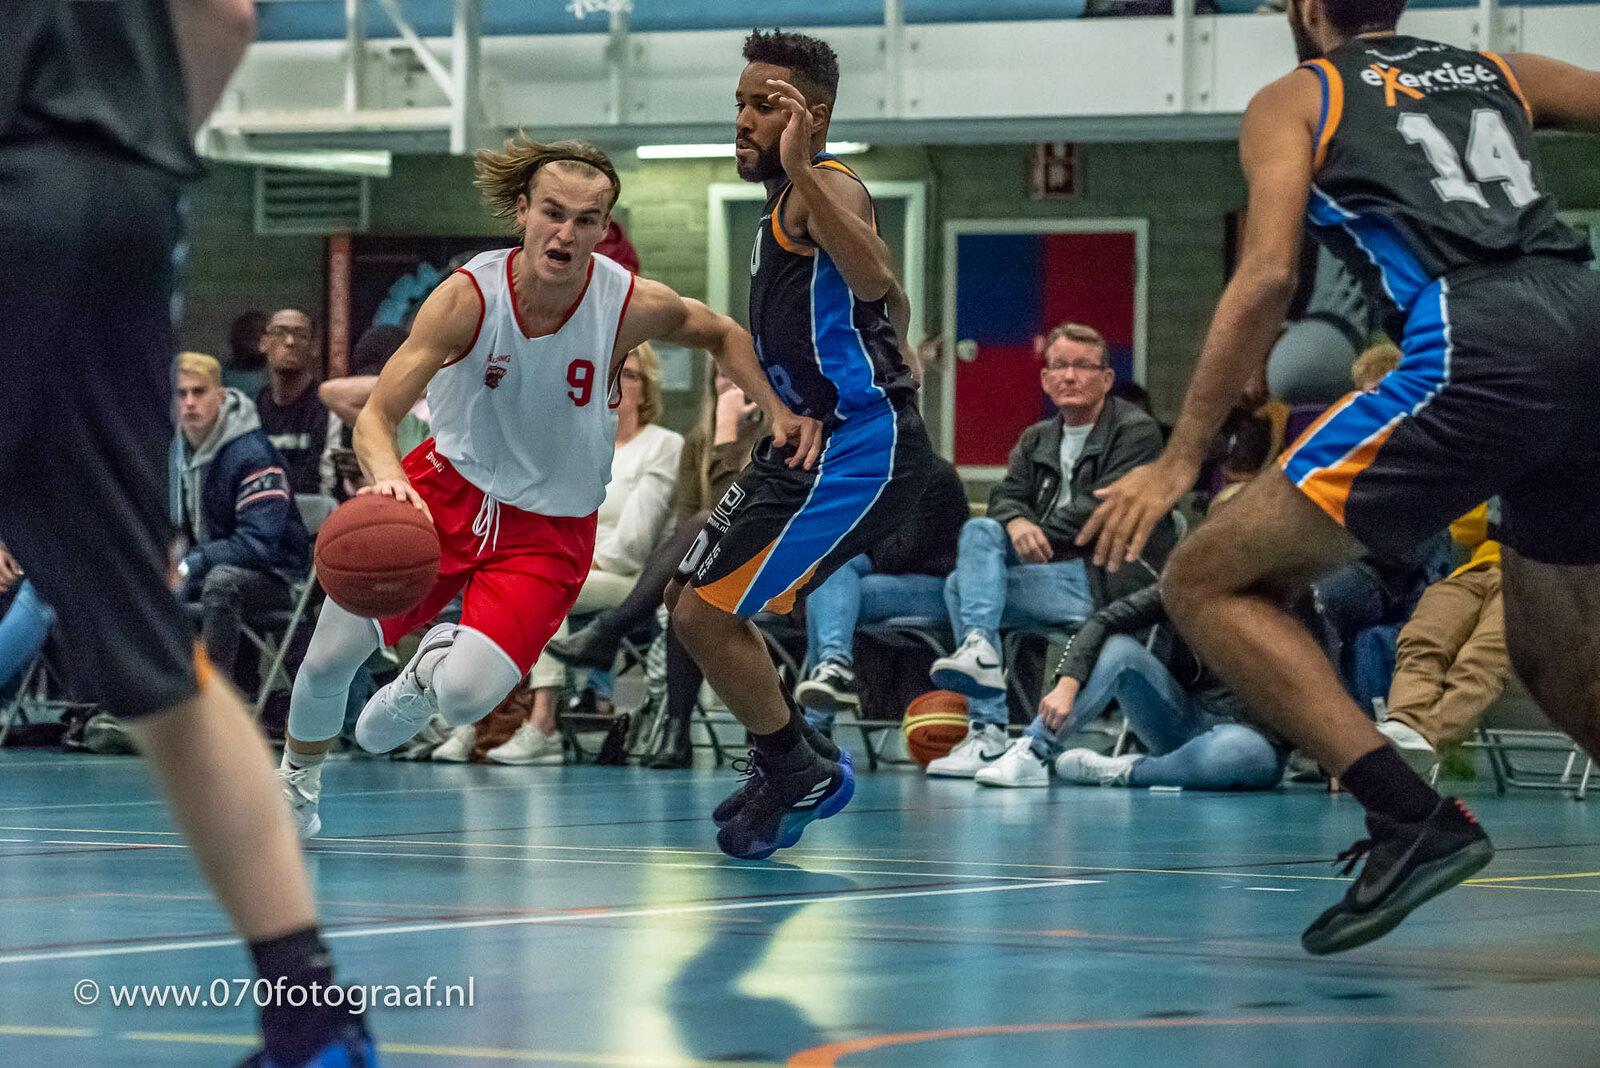 Basketball: 2018-10-20 CobraNova MSE 1 – Lokomotief MSE 1 [62-82]